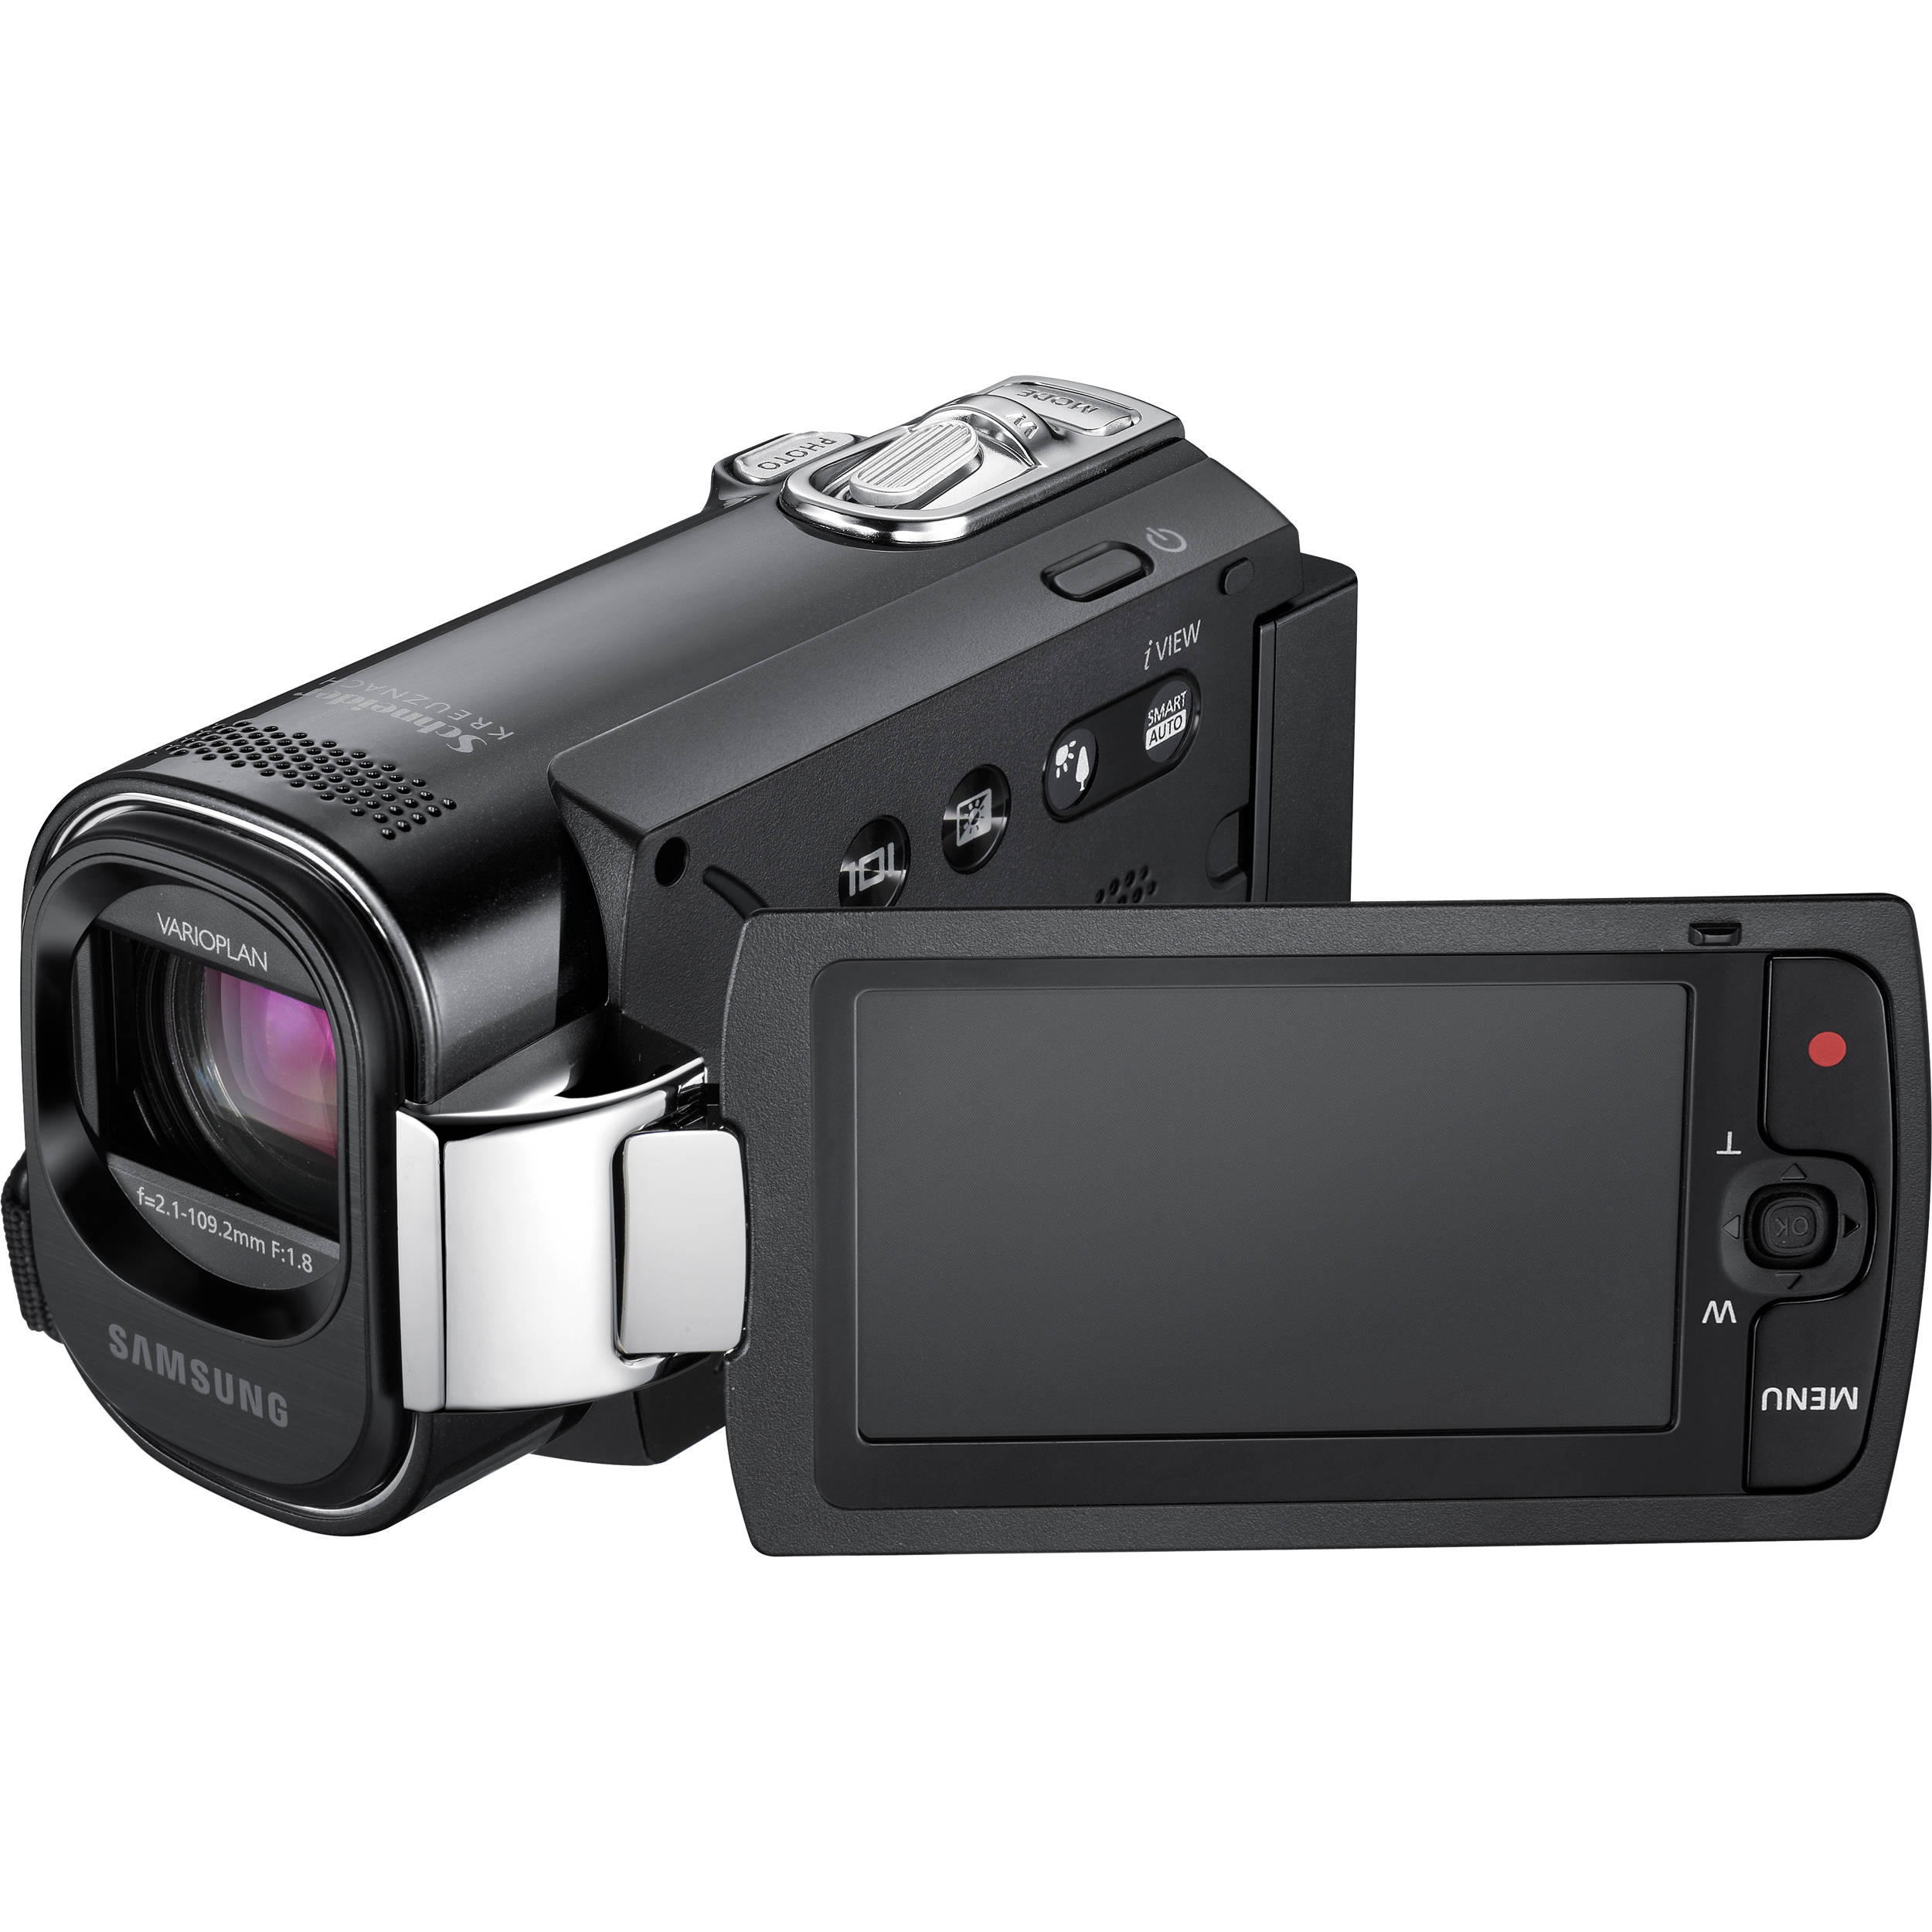 samsung smx f44 digital memory camcorder black